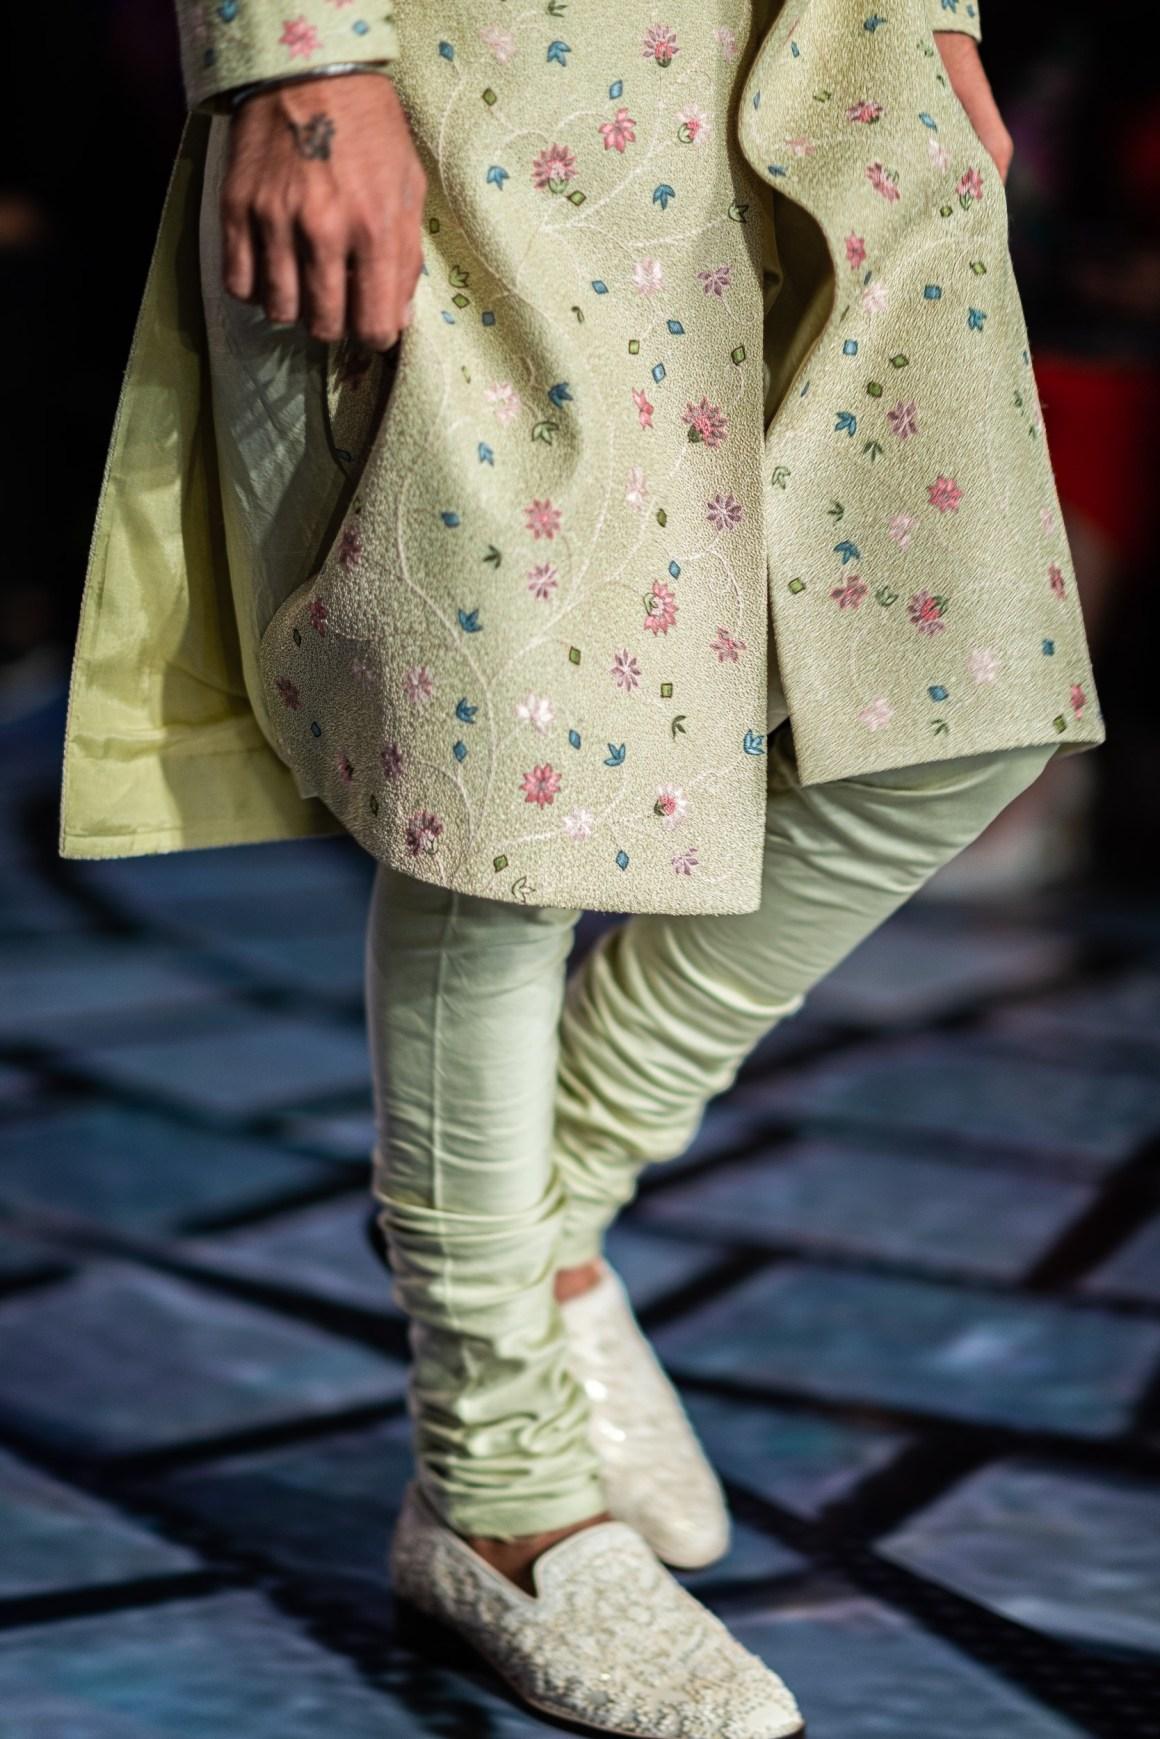 naina.co, naina redhu, rahul mishra, india couture week 2019, couture week, FDCI, taj palace new delhi, taj palace, indian couture, made in india, madeinindia, make in india, makeinindia, eyesforfashion, nainaxrahulmishra, fashion week, fashion show, runway, photography client, photography assignment, fashion photography, runway photography, malhausi, monaco, embroidery, french knots, divya mishra